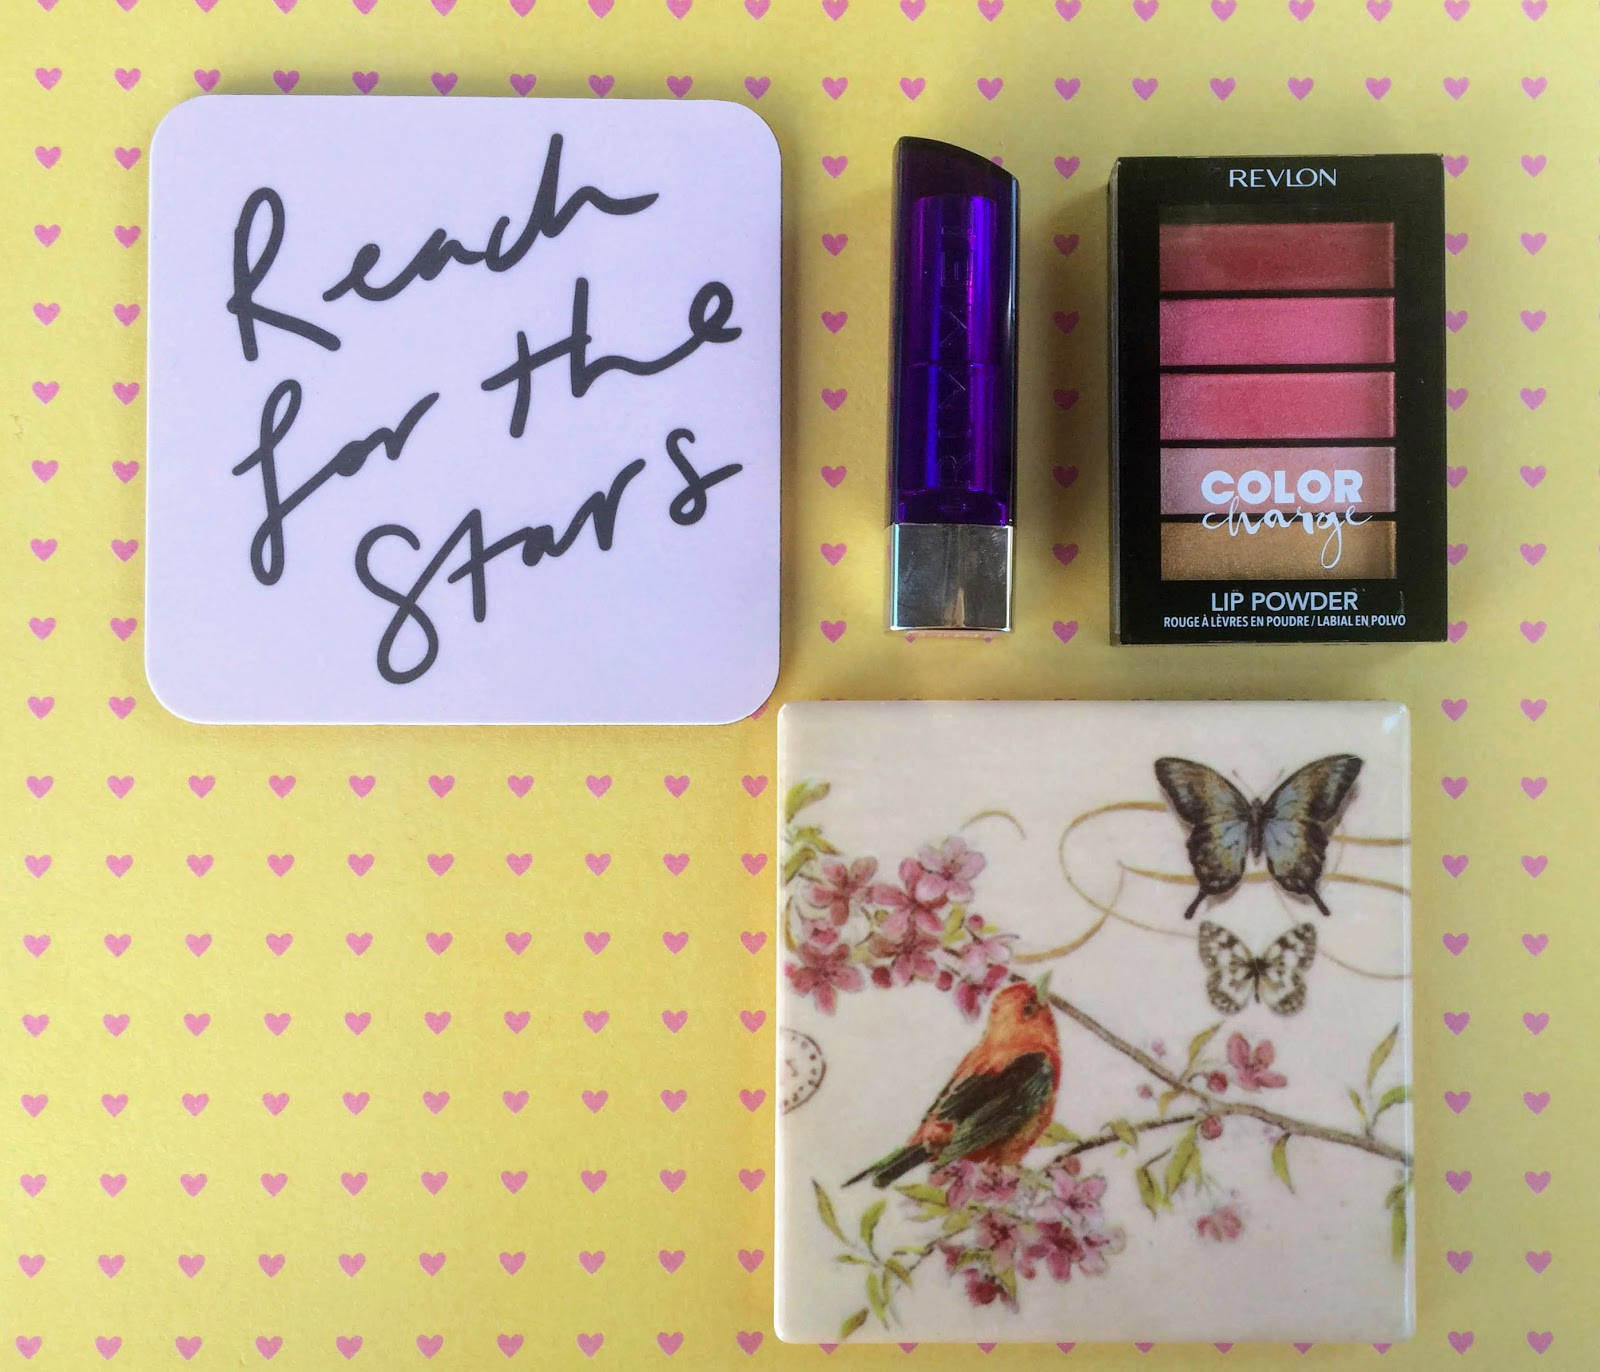 Rimmel lipstick, old english prints coaster, revlon Lip powder